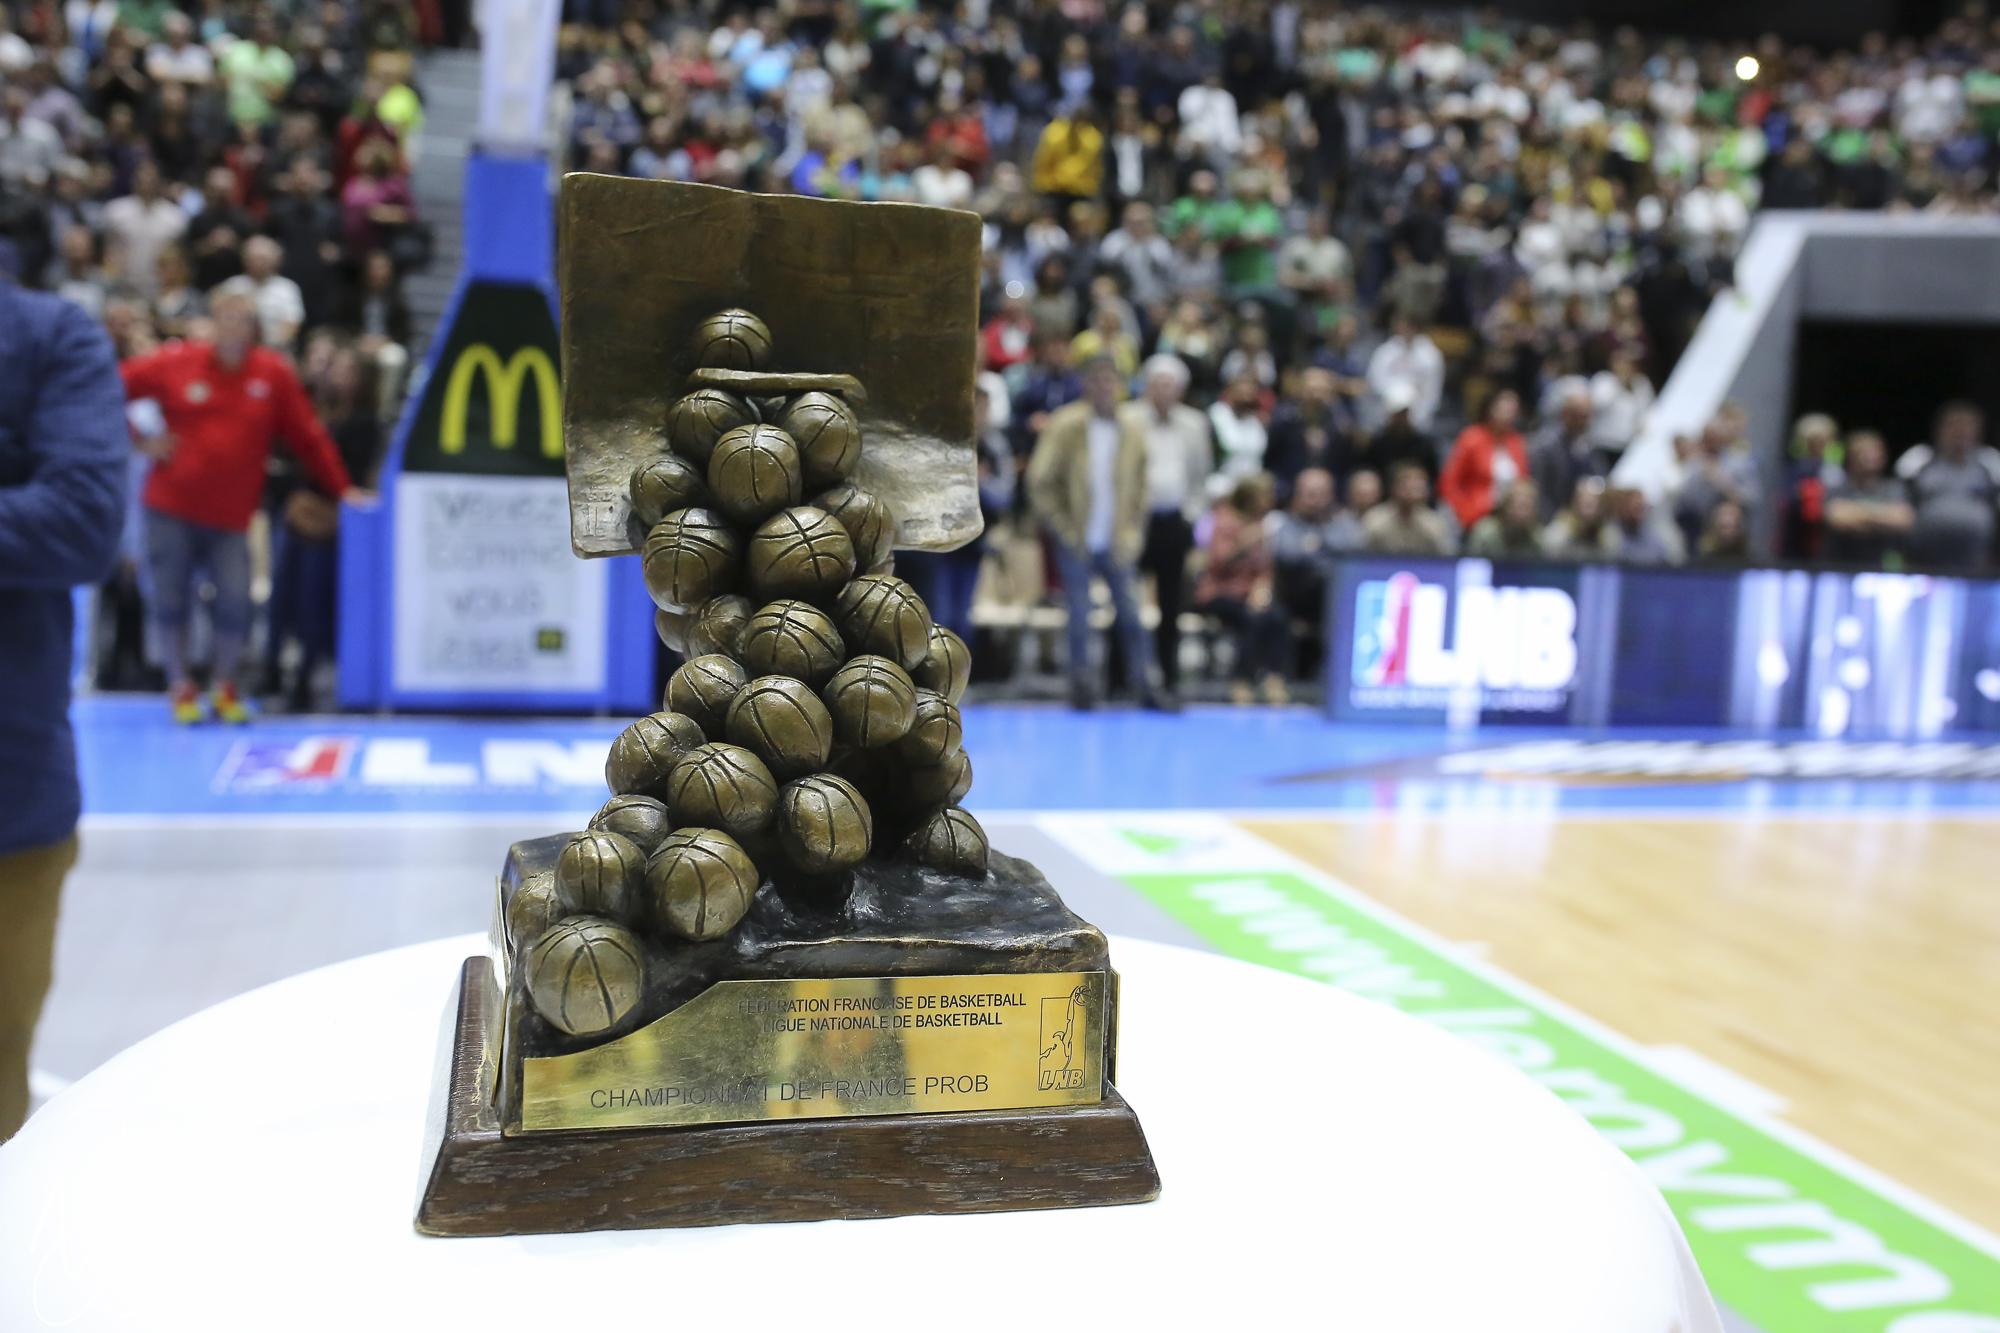 ChampionVx Noir ChampionVx Baskets Baskets ChampionVx Baskets Noir ChampionVx Noir nkXw0O8P